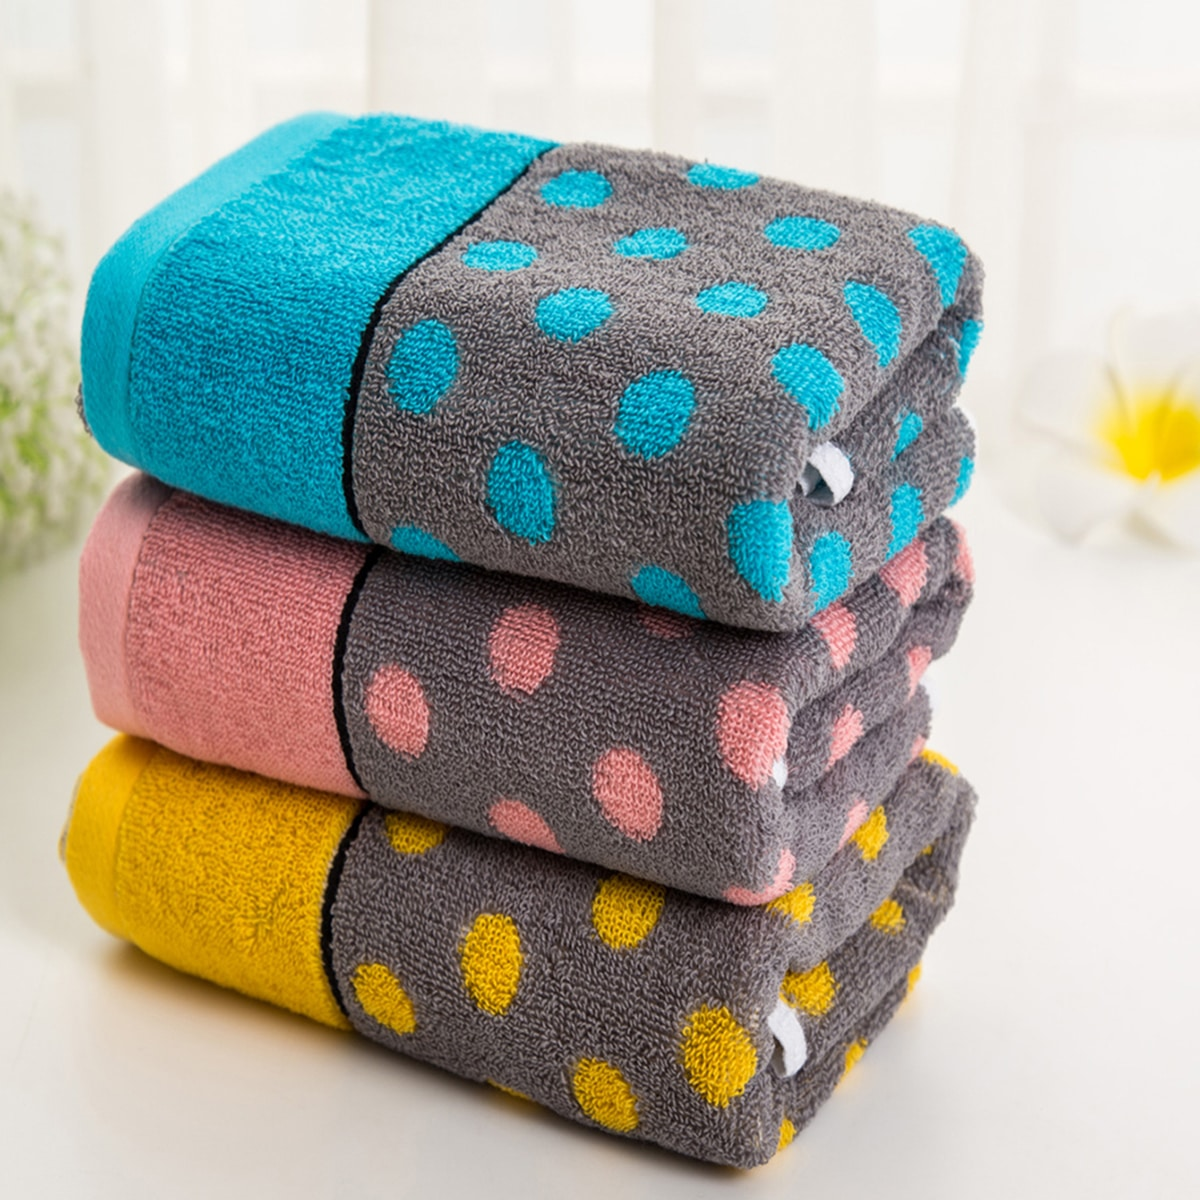 1pc handdoek met polkadotprint